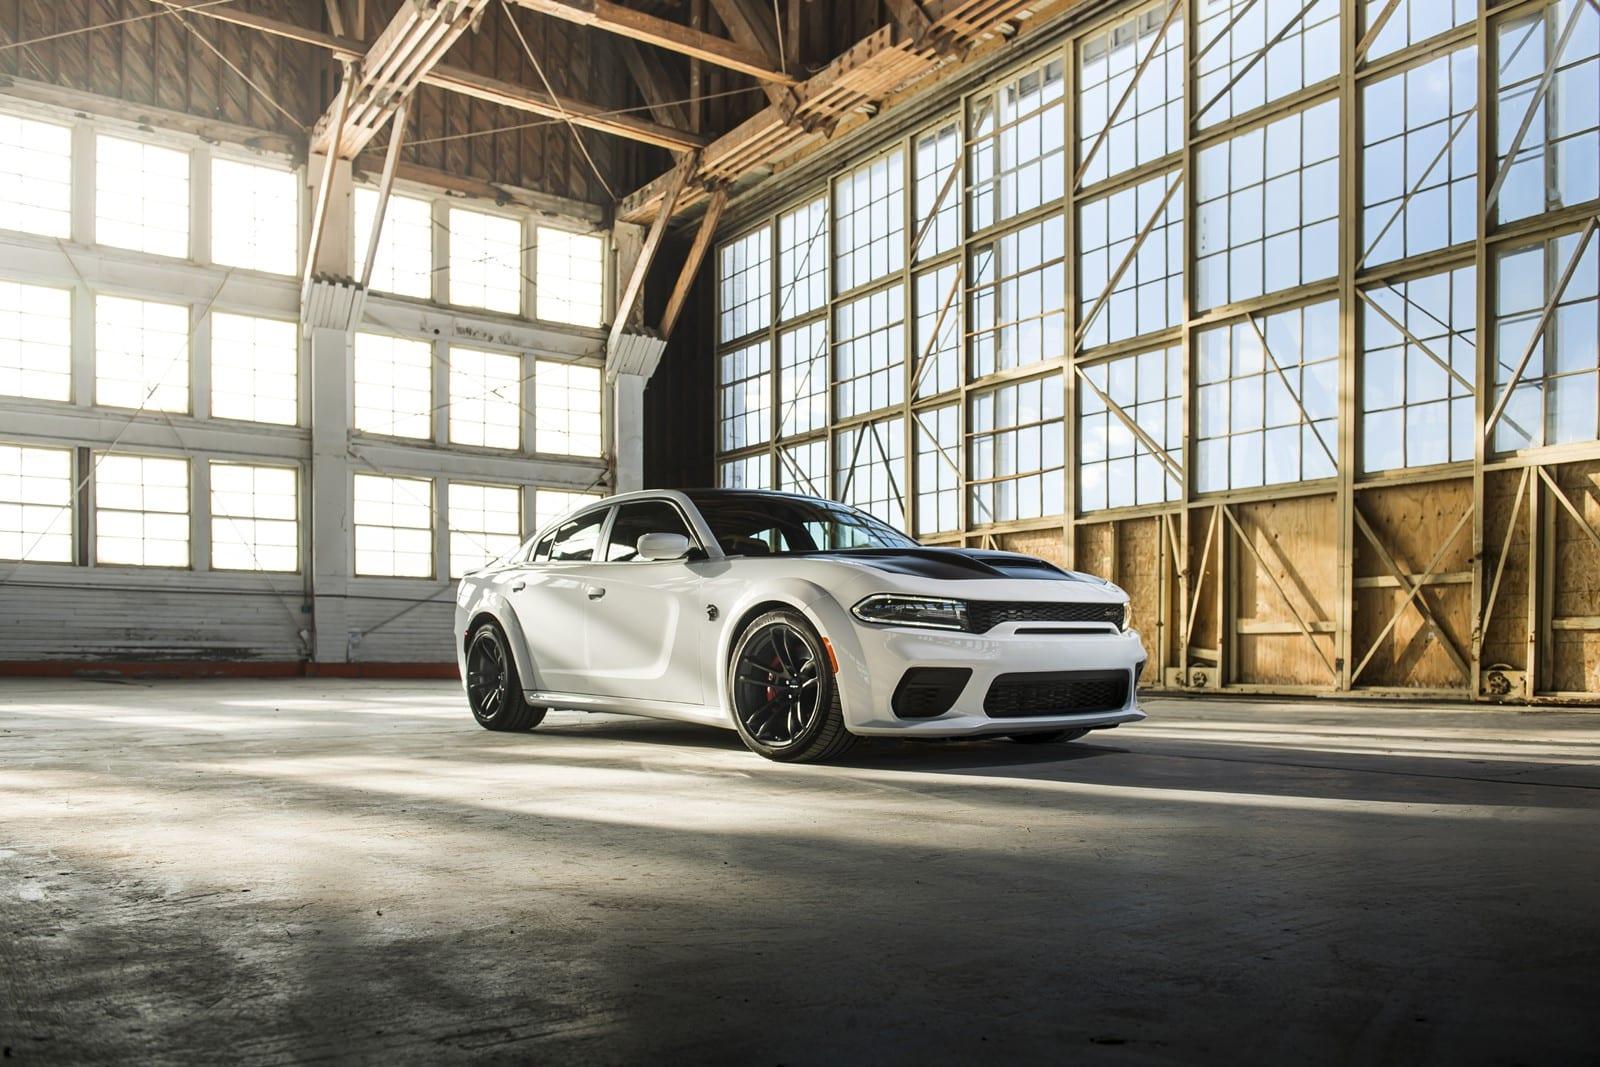 Dodge Charger Srt Hellcat Redeye 2021 Mas Bestia Que Nunca